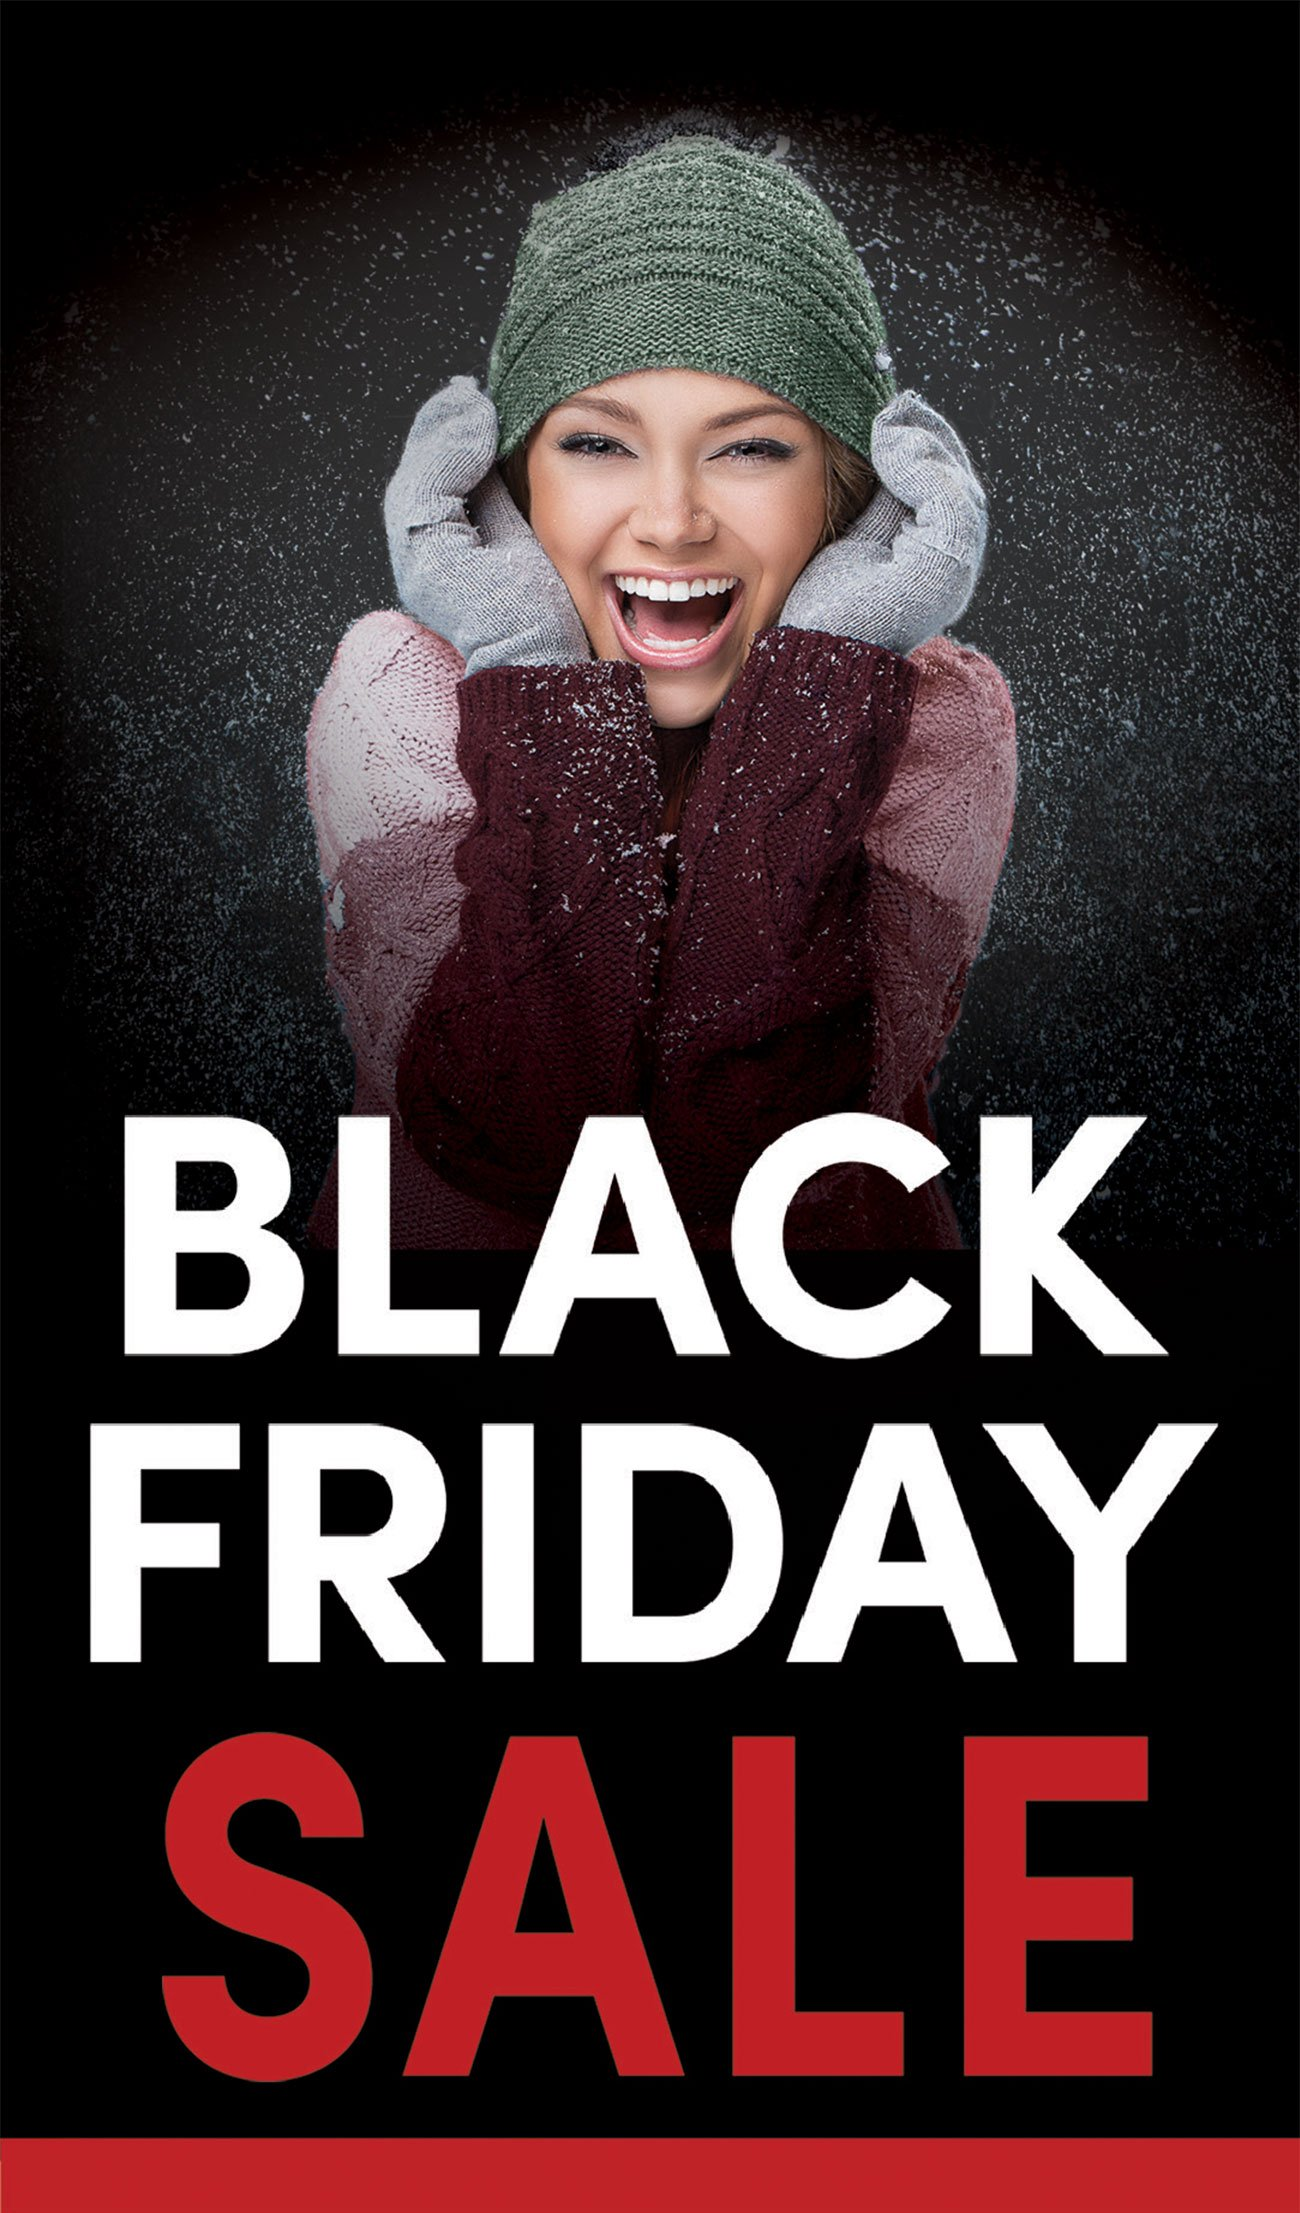 Black-Friday-Sale-Tall-Header